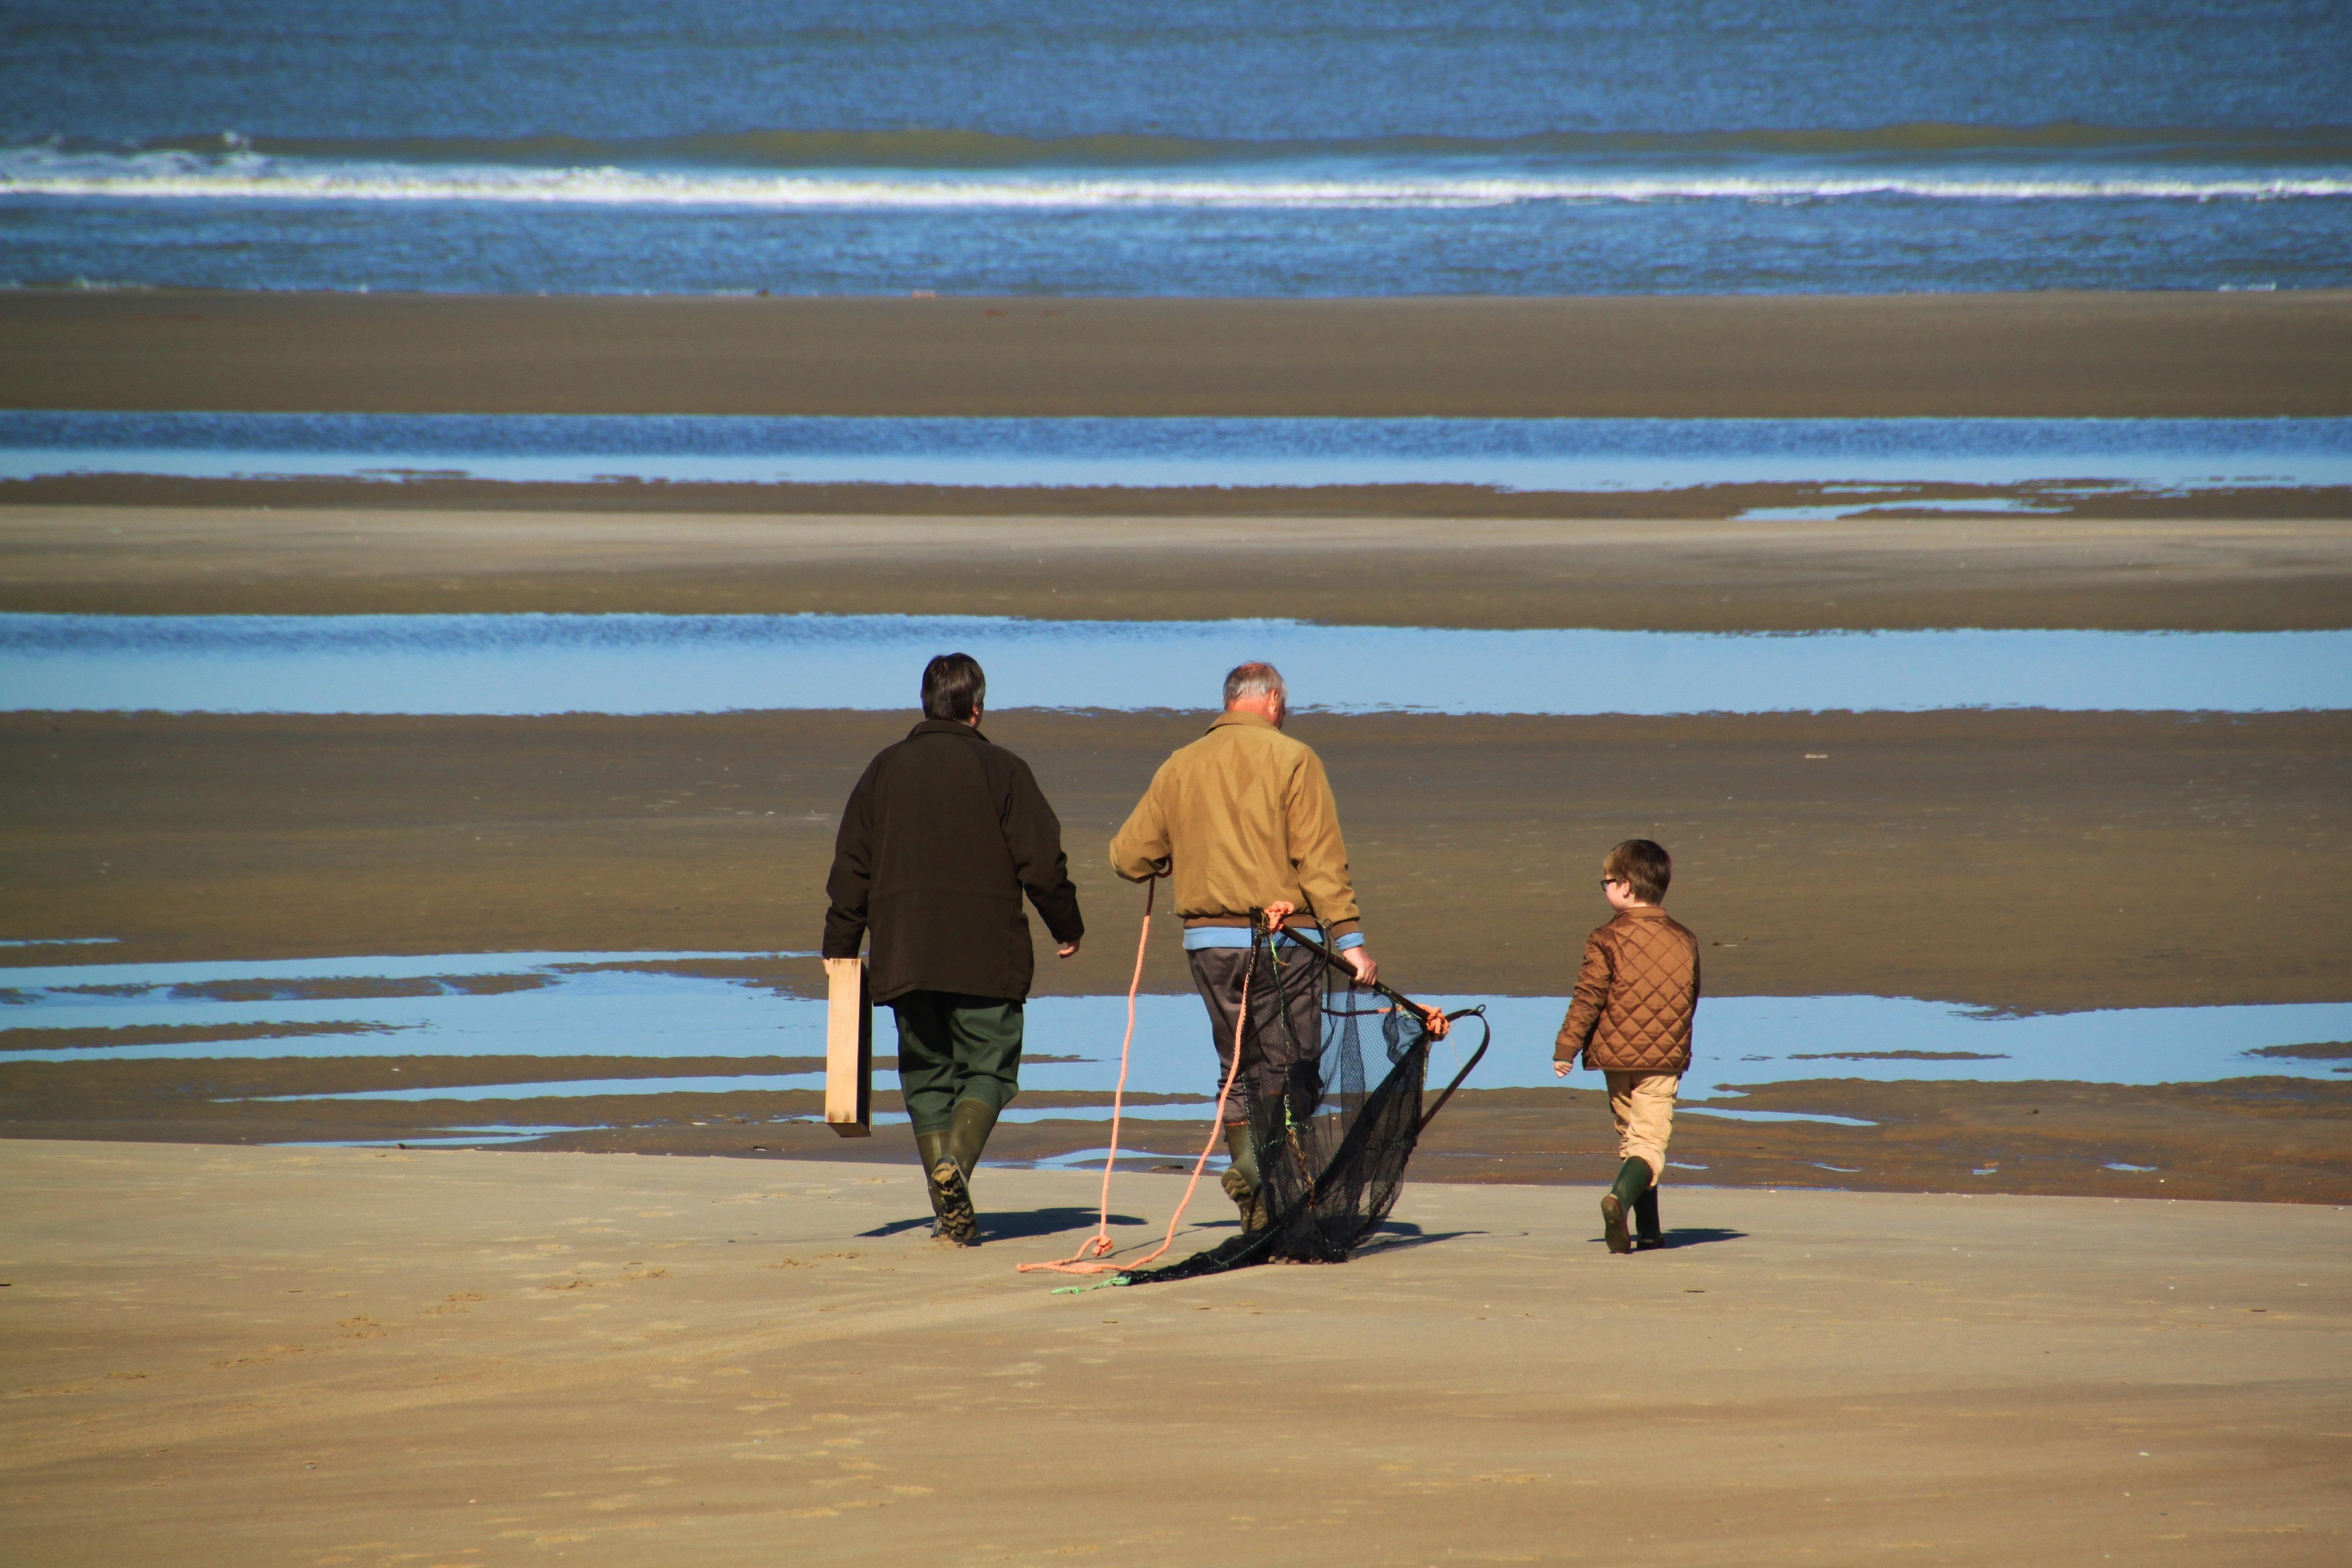 Family, Activity, Beach, Flow, Sea, HQ Photo